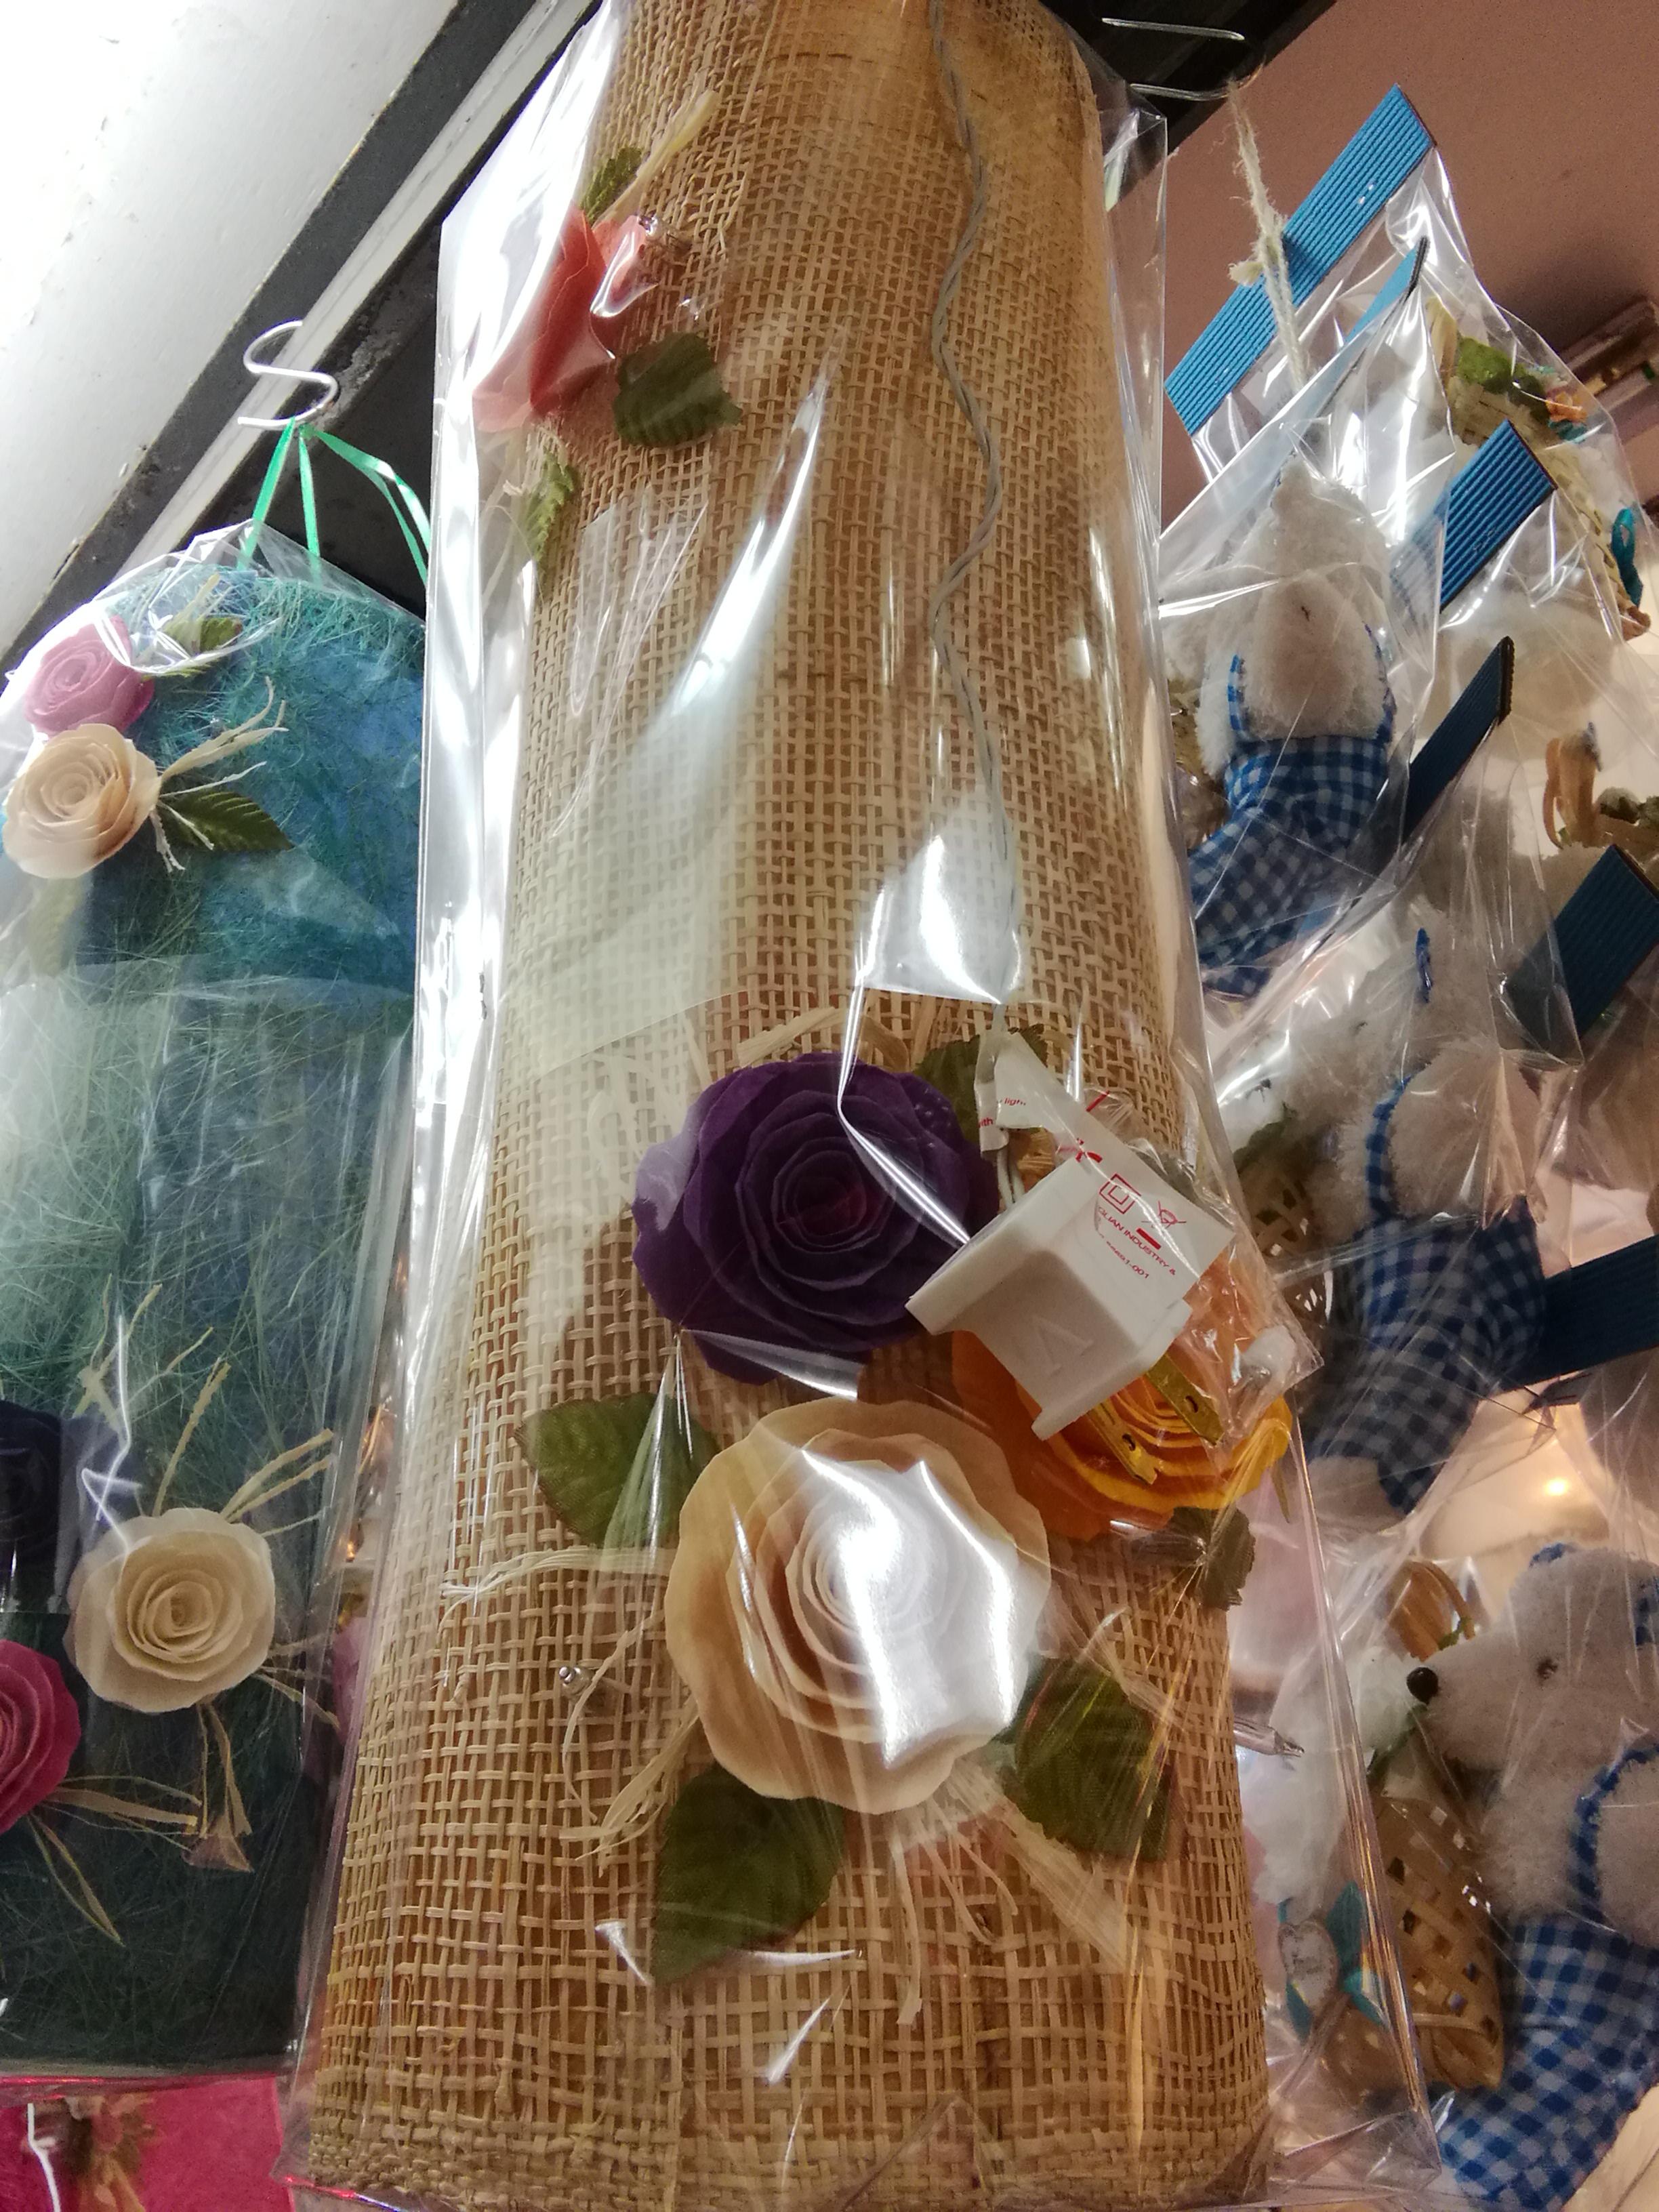 Free Images Arts Crafts Handmade Decoration Lamp Floral